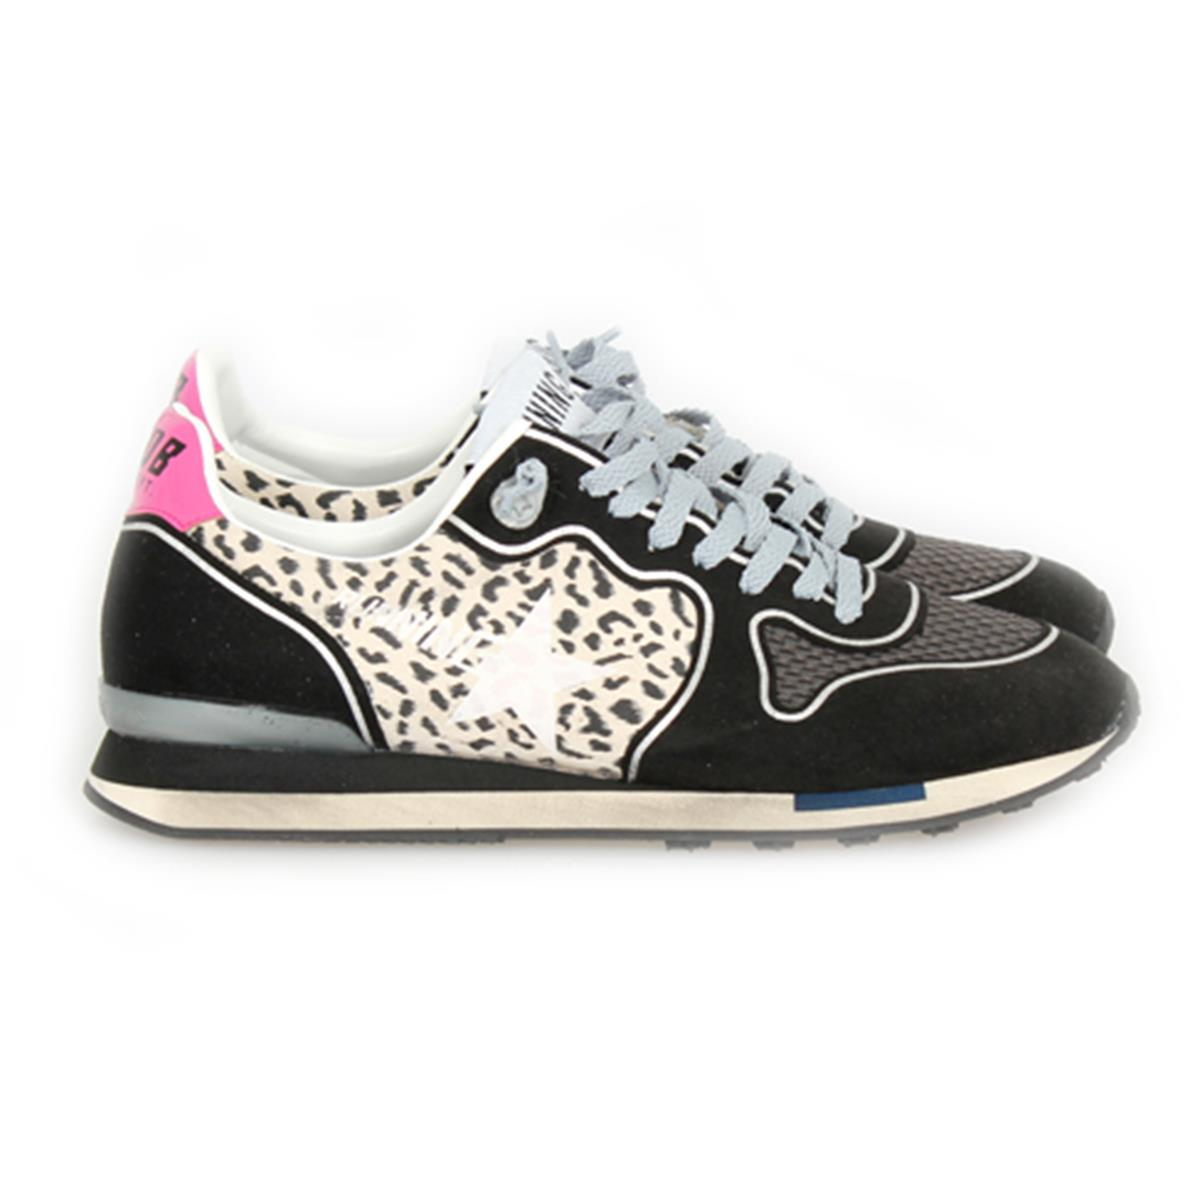 webshop kim werner golden goose deluxe brand sneaker running leopard peonia. Black Bedroom Furniture Sets. Home Design Ideas